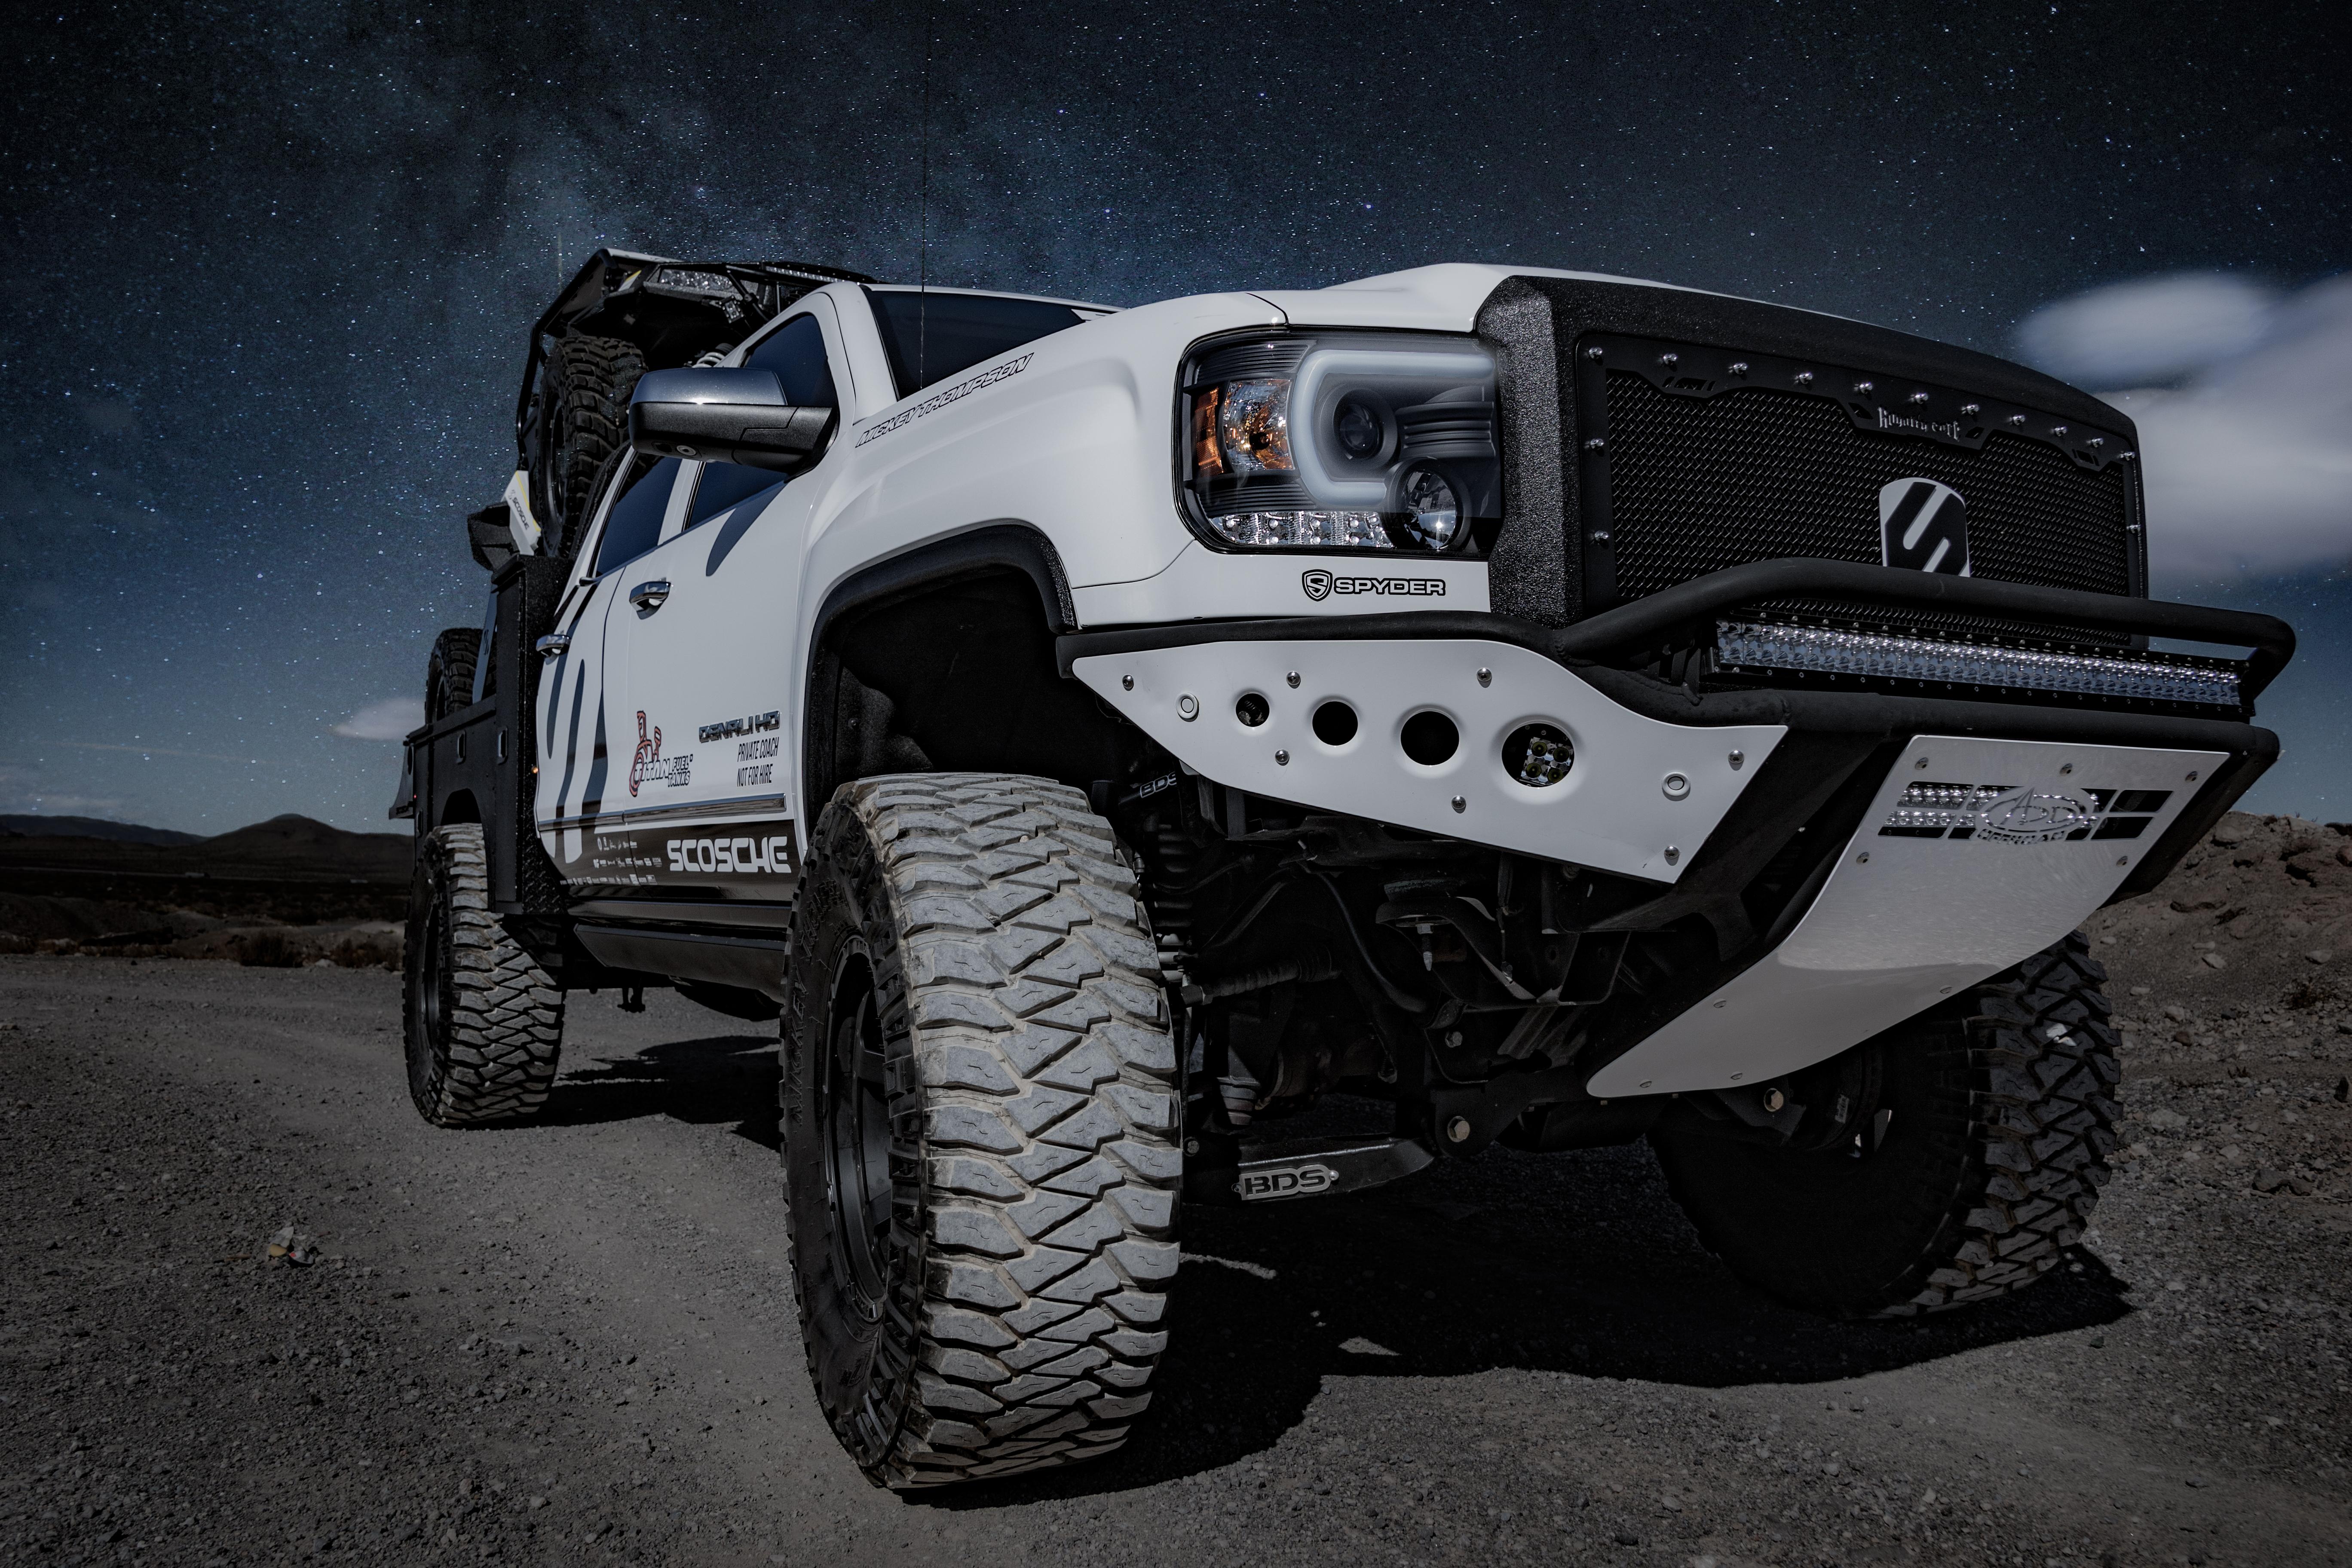 White Dodge Ram 1500 Pickup Truck